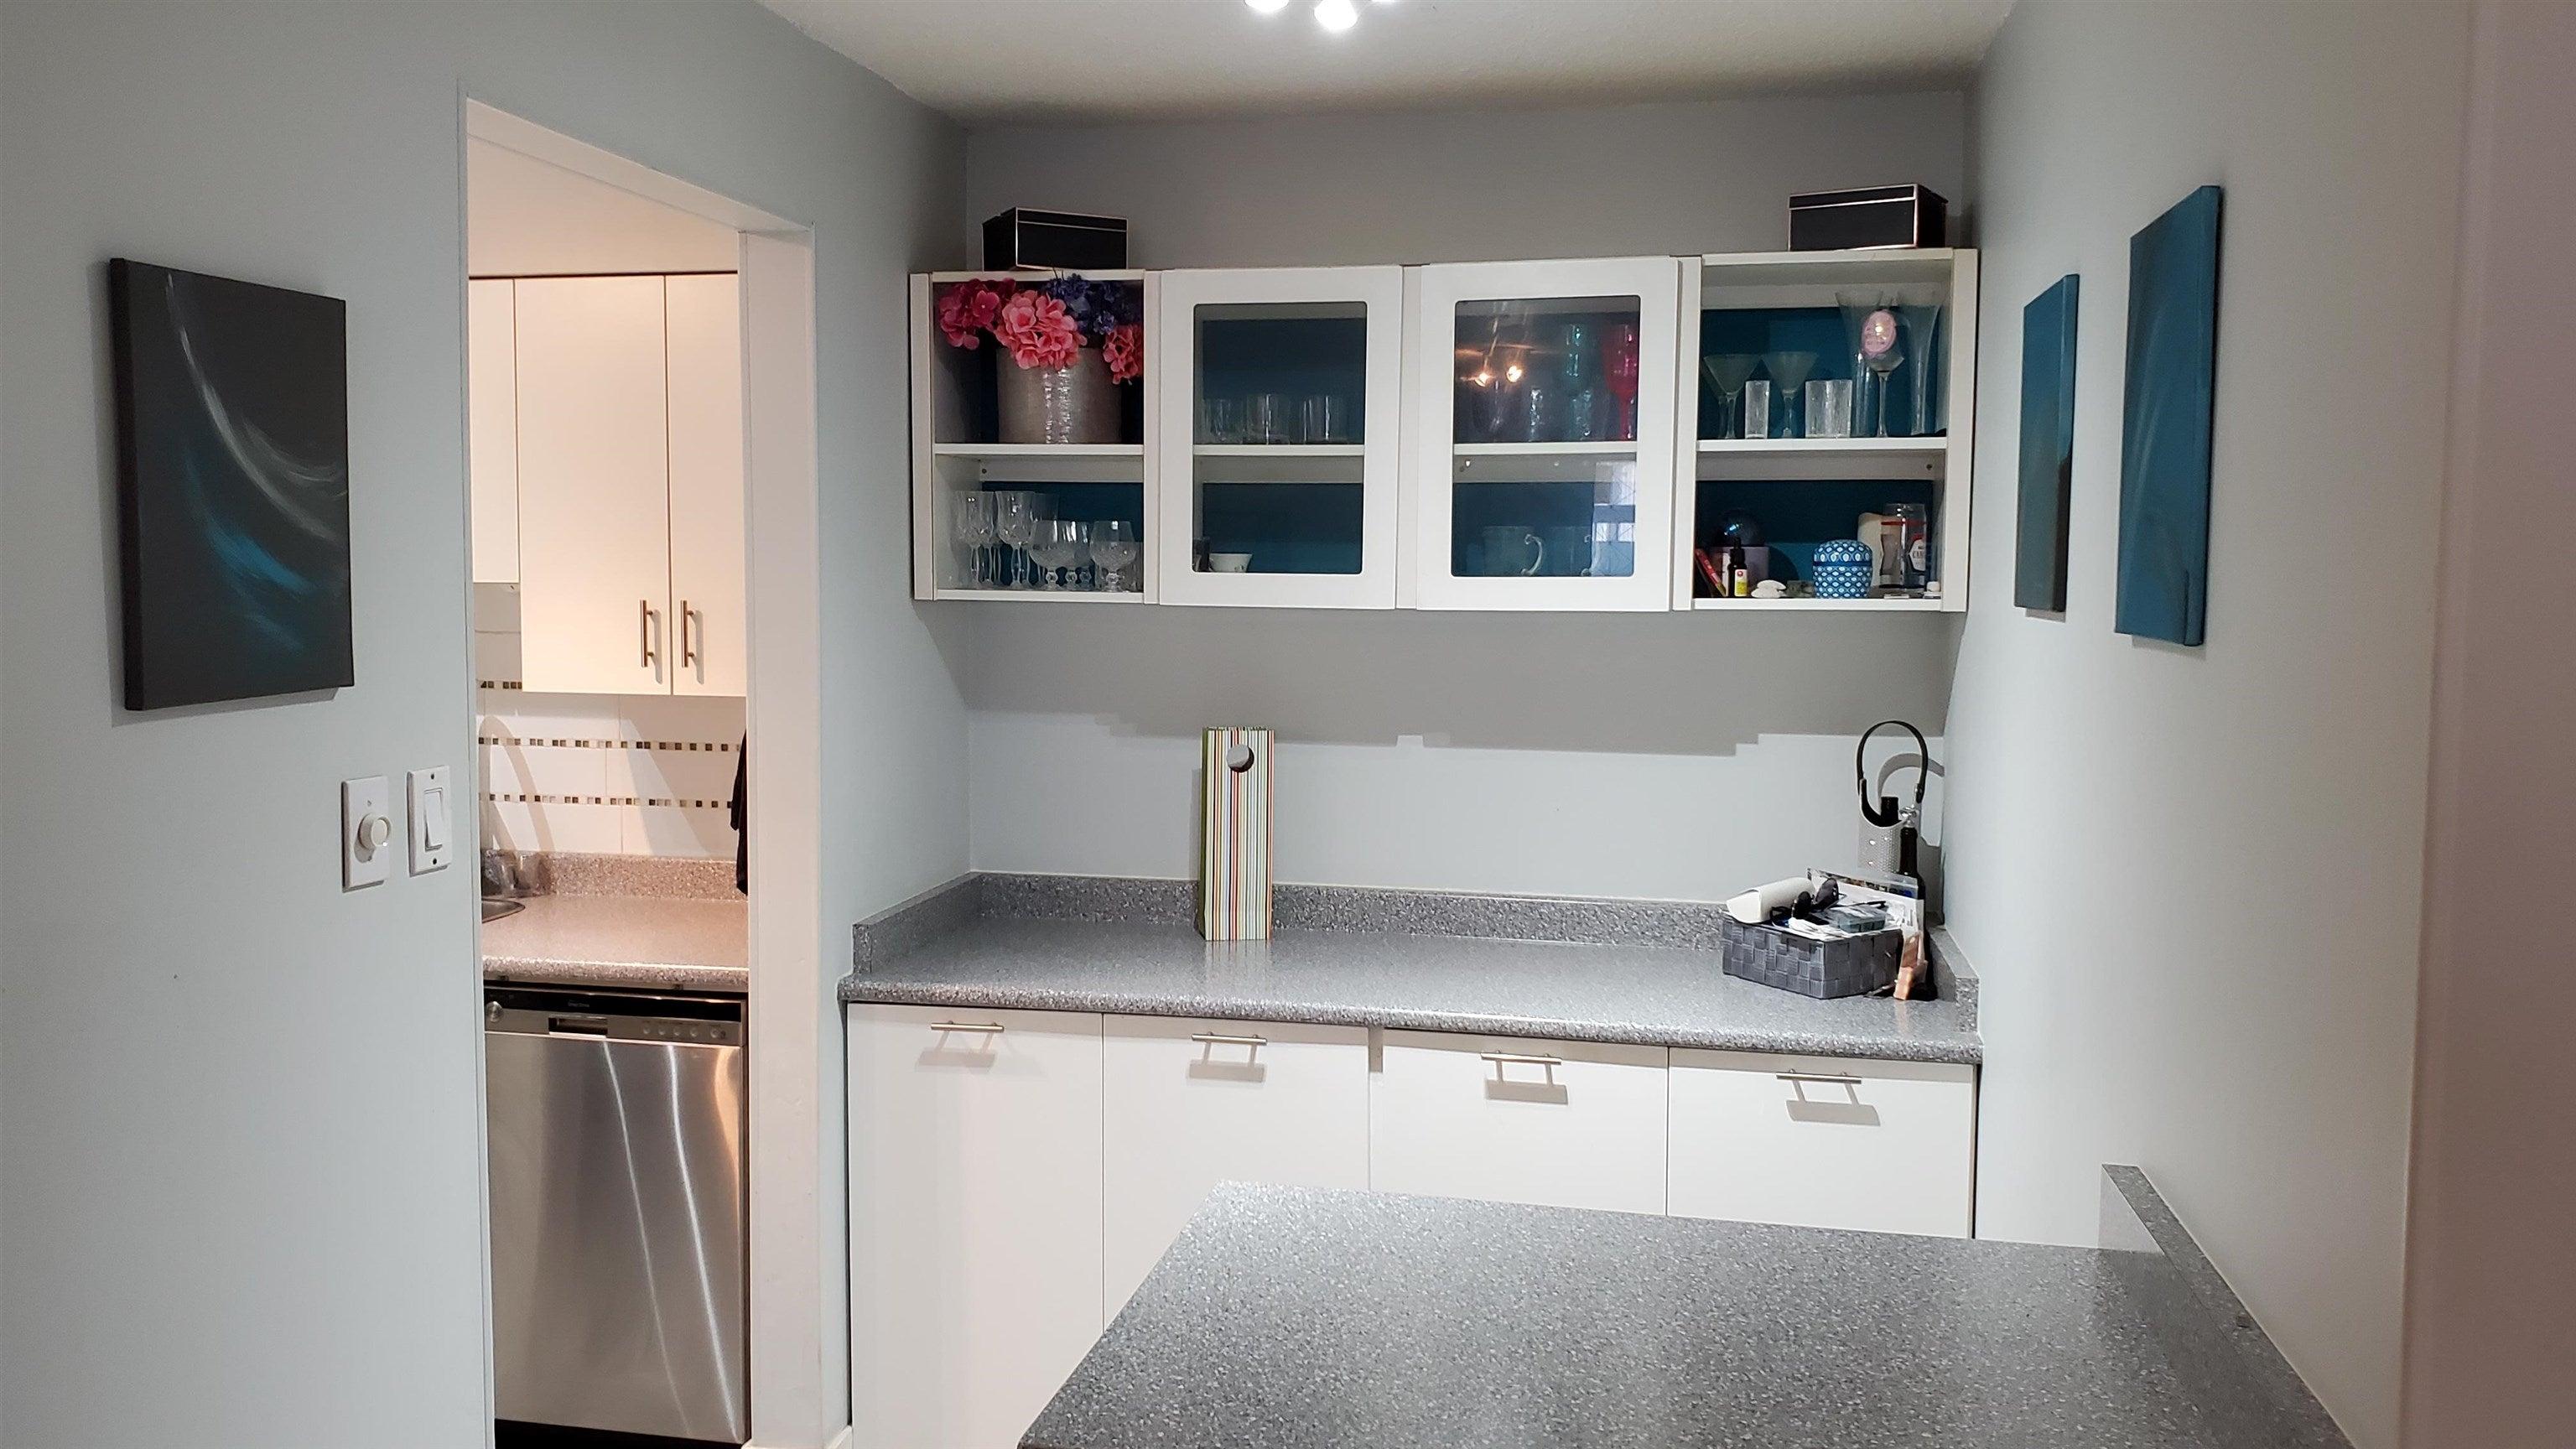 120 11806 88 AVENUE - Annieville Apartment/Condo for sale, 2 Bedrooms (R2616862) - #6